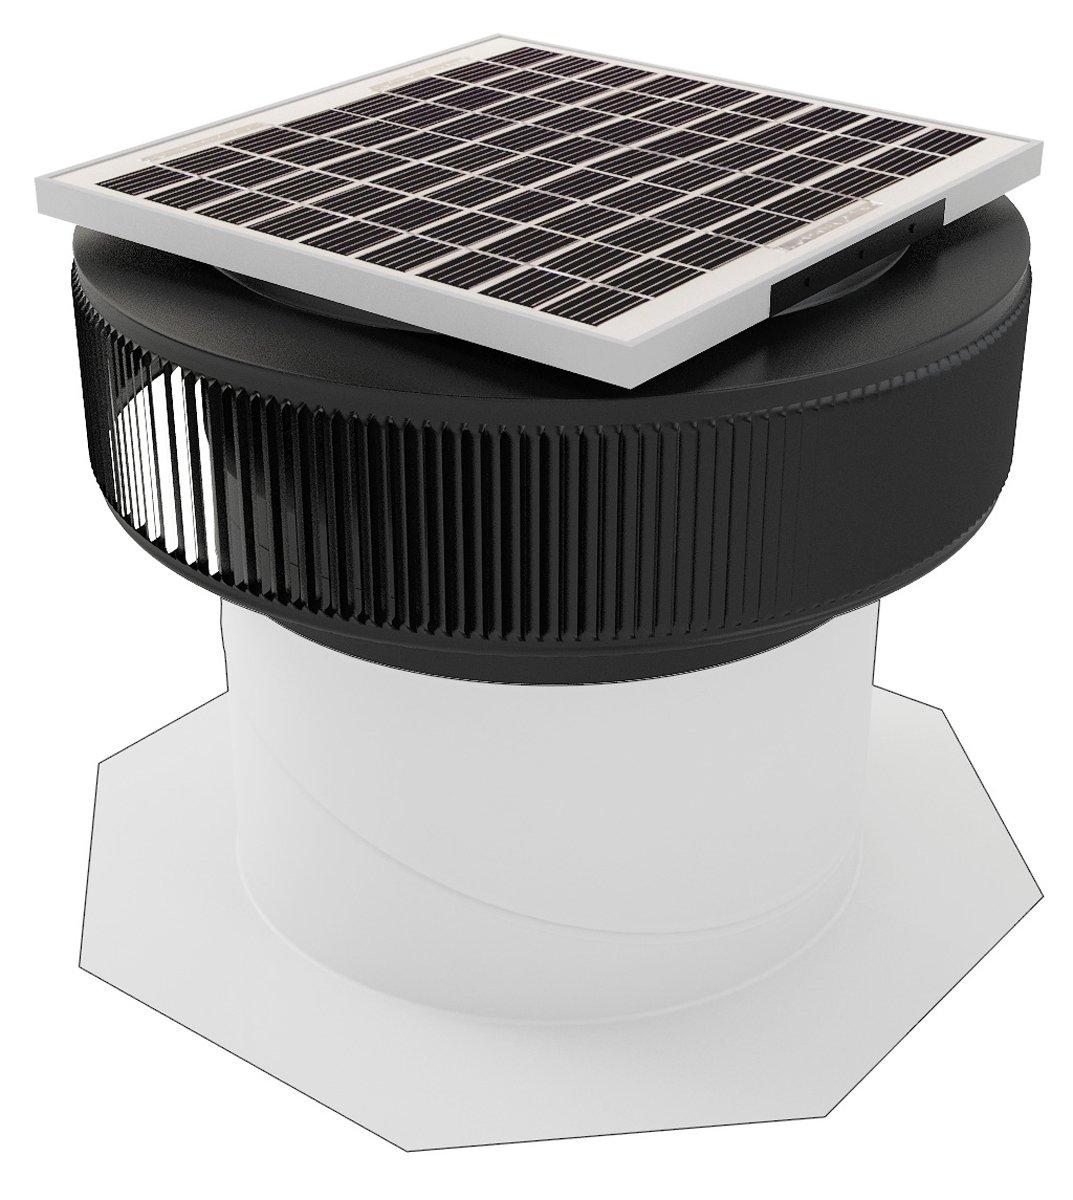 14 in. Aluminum Round 15 Watt Solar-Powered Roof Exhaust Fan in Black